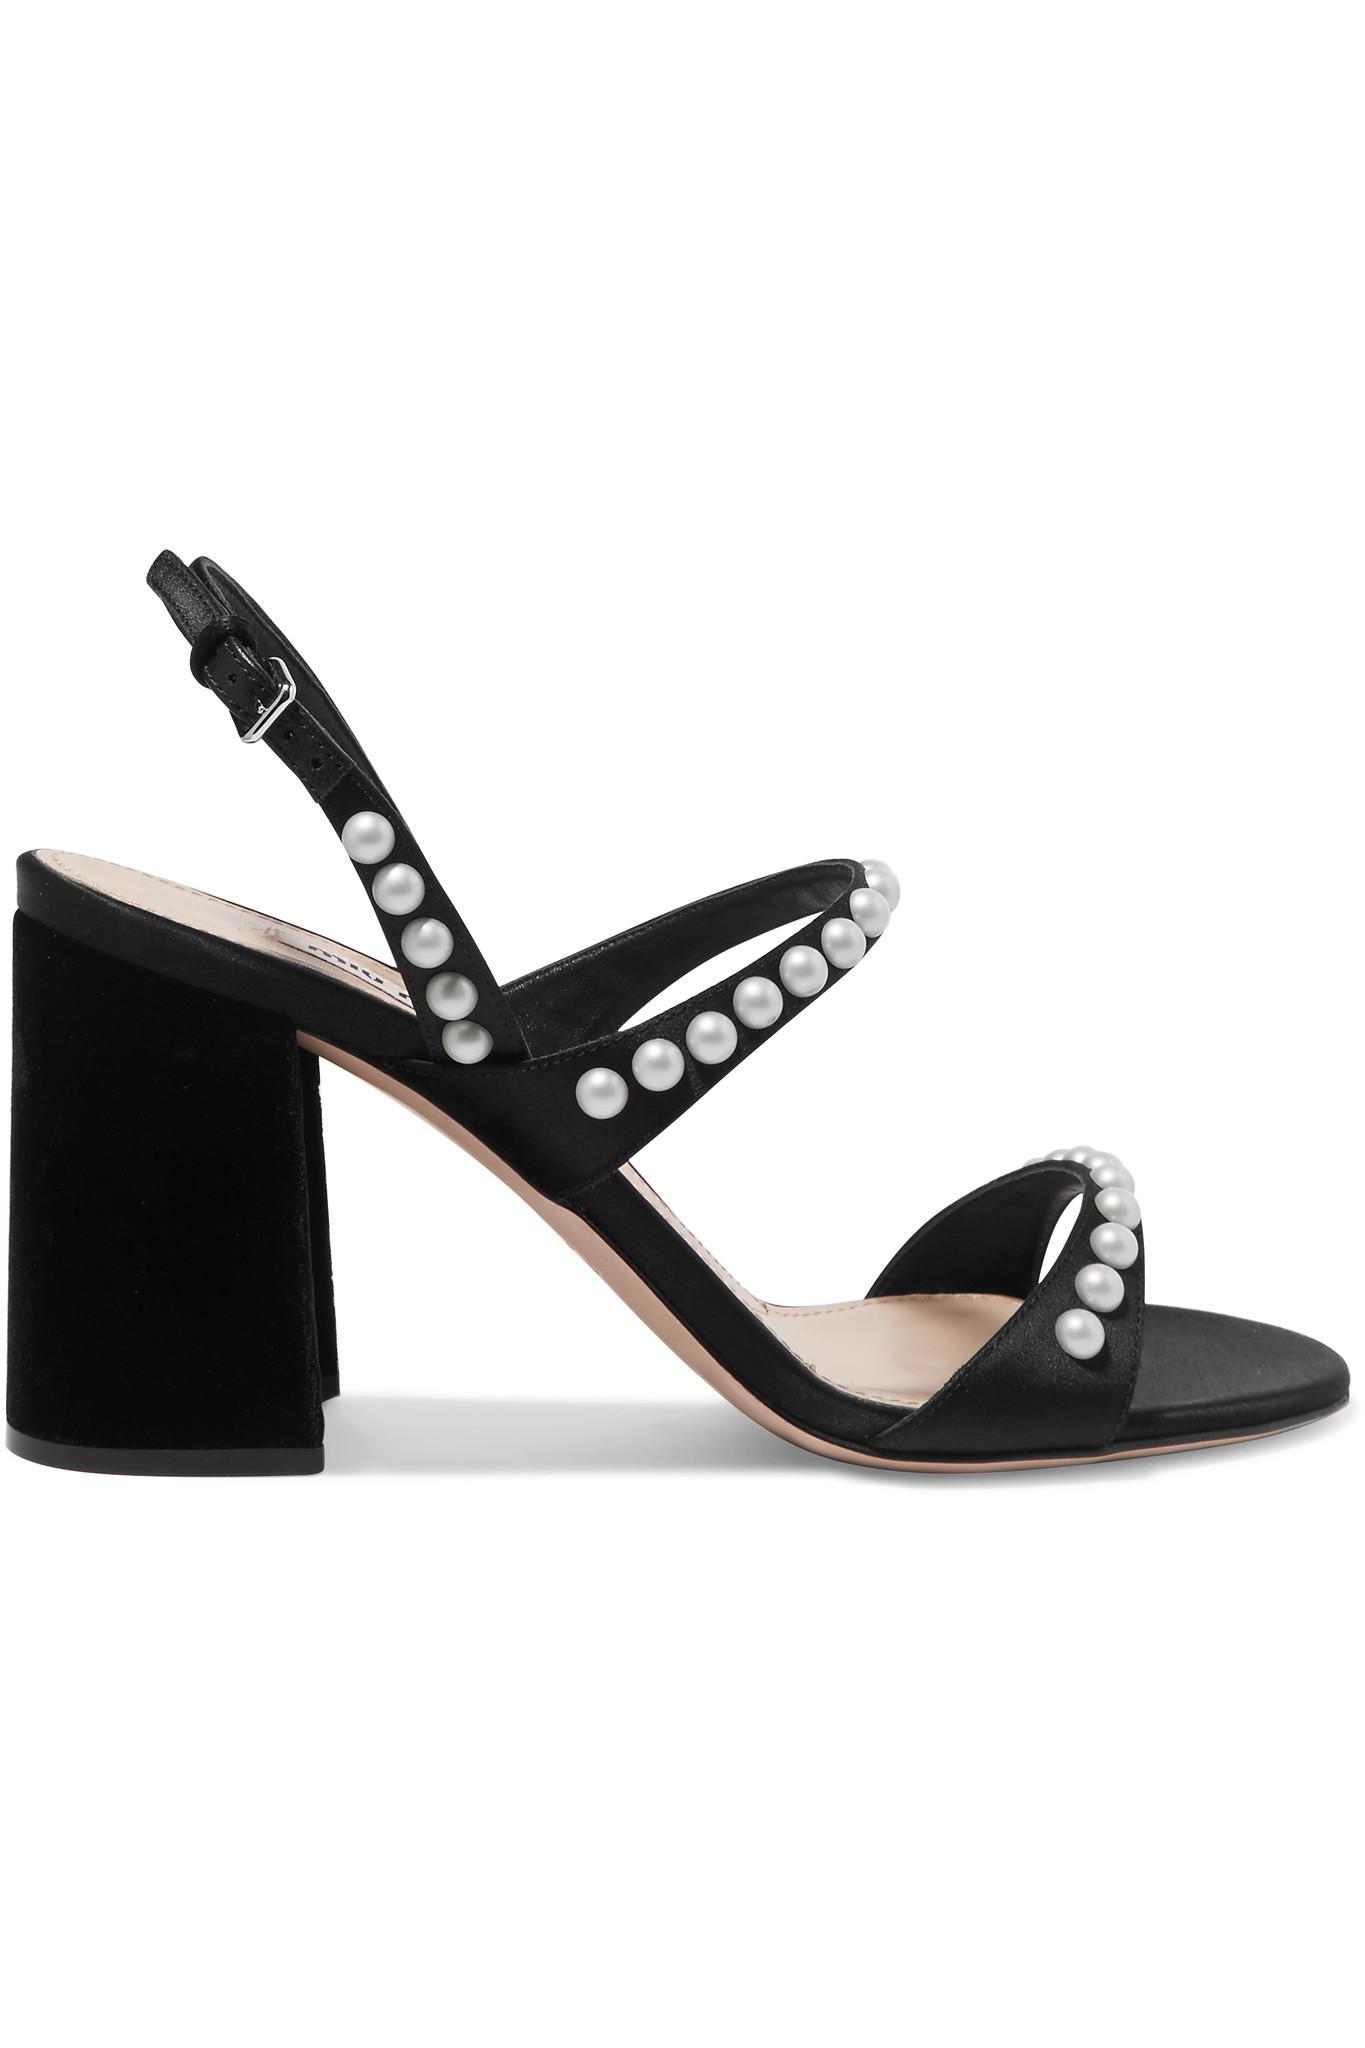 5a62dadeb11 Miu Miu Faux Pearl-embellished Suede Slingback Sandals in Black - Lyst